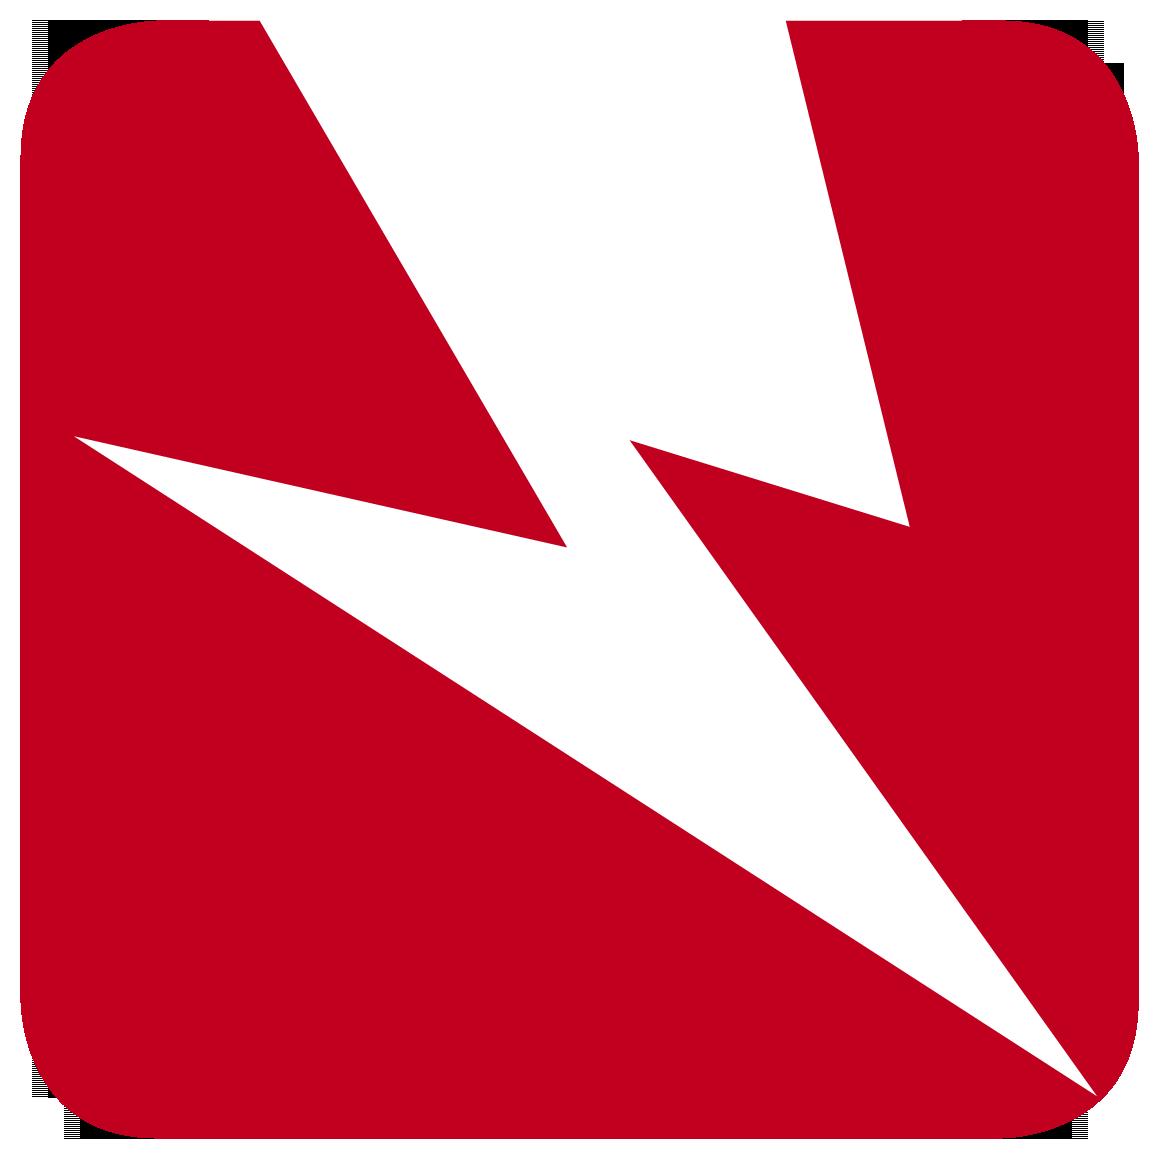 » Mediacenter-Datenarchiv » Bilder_Strom » icon_strom_2.png